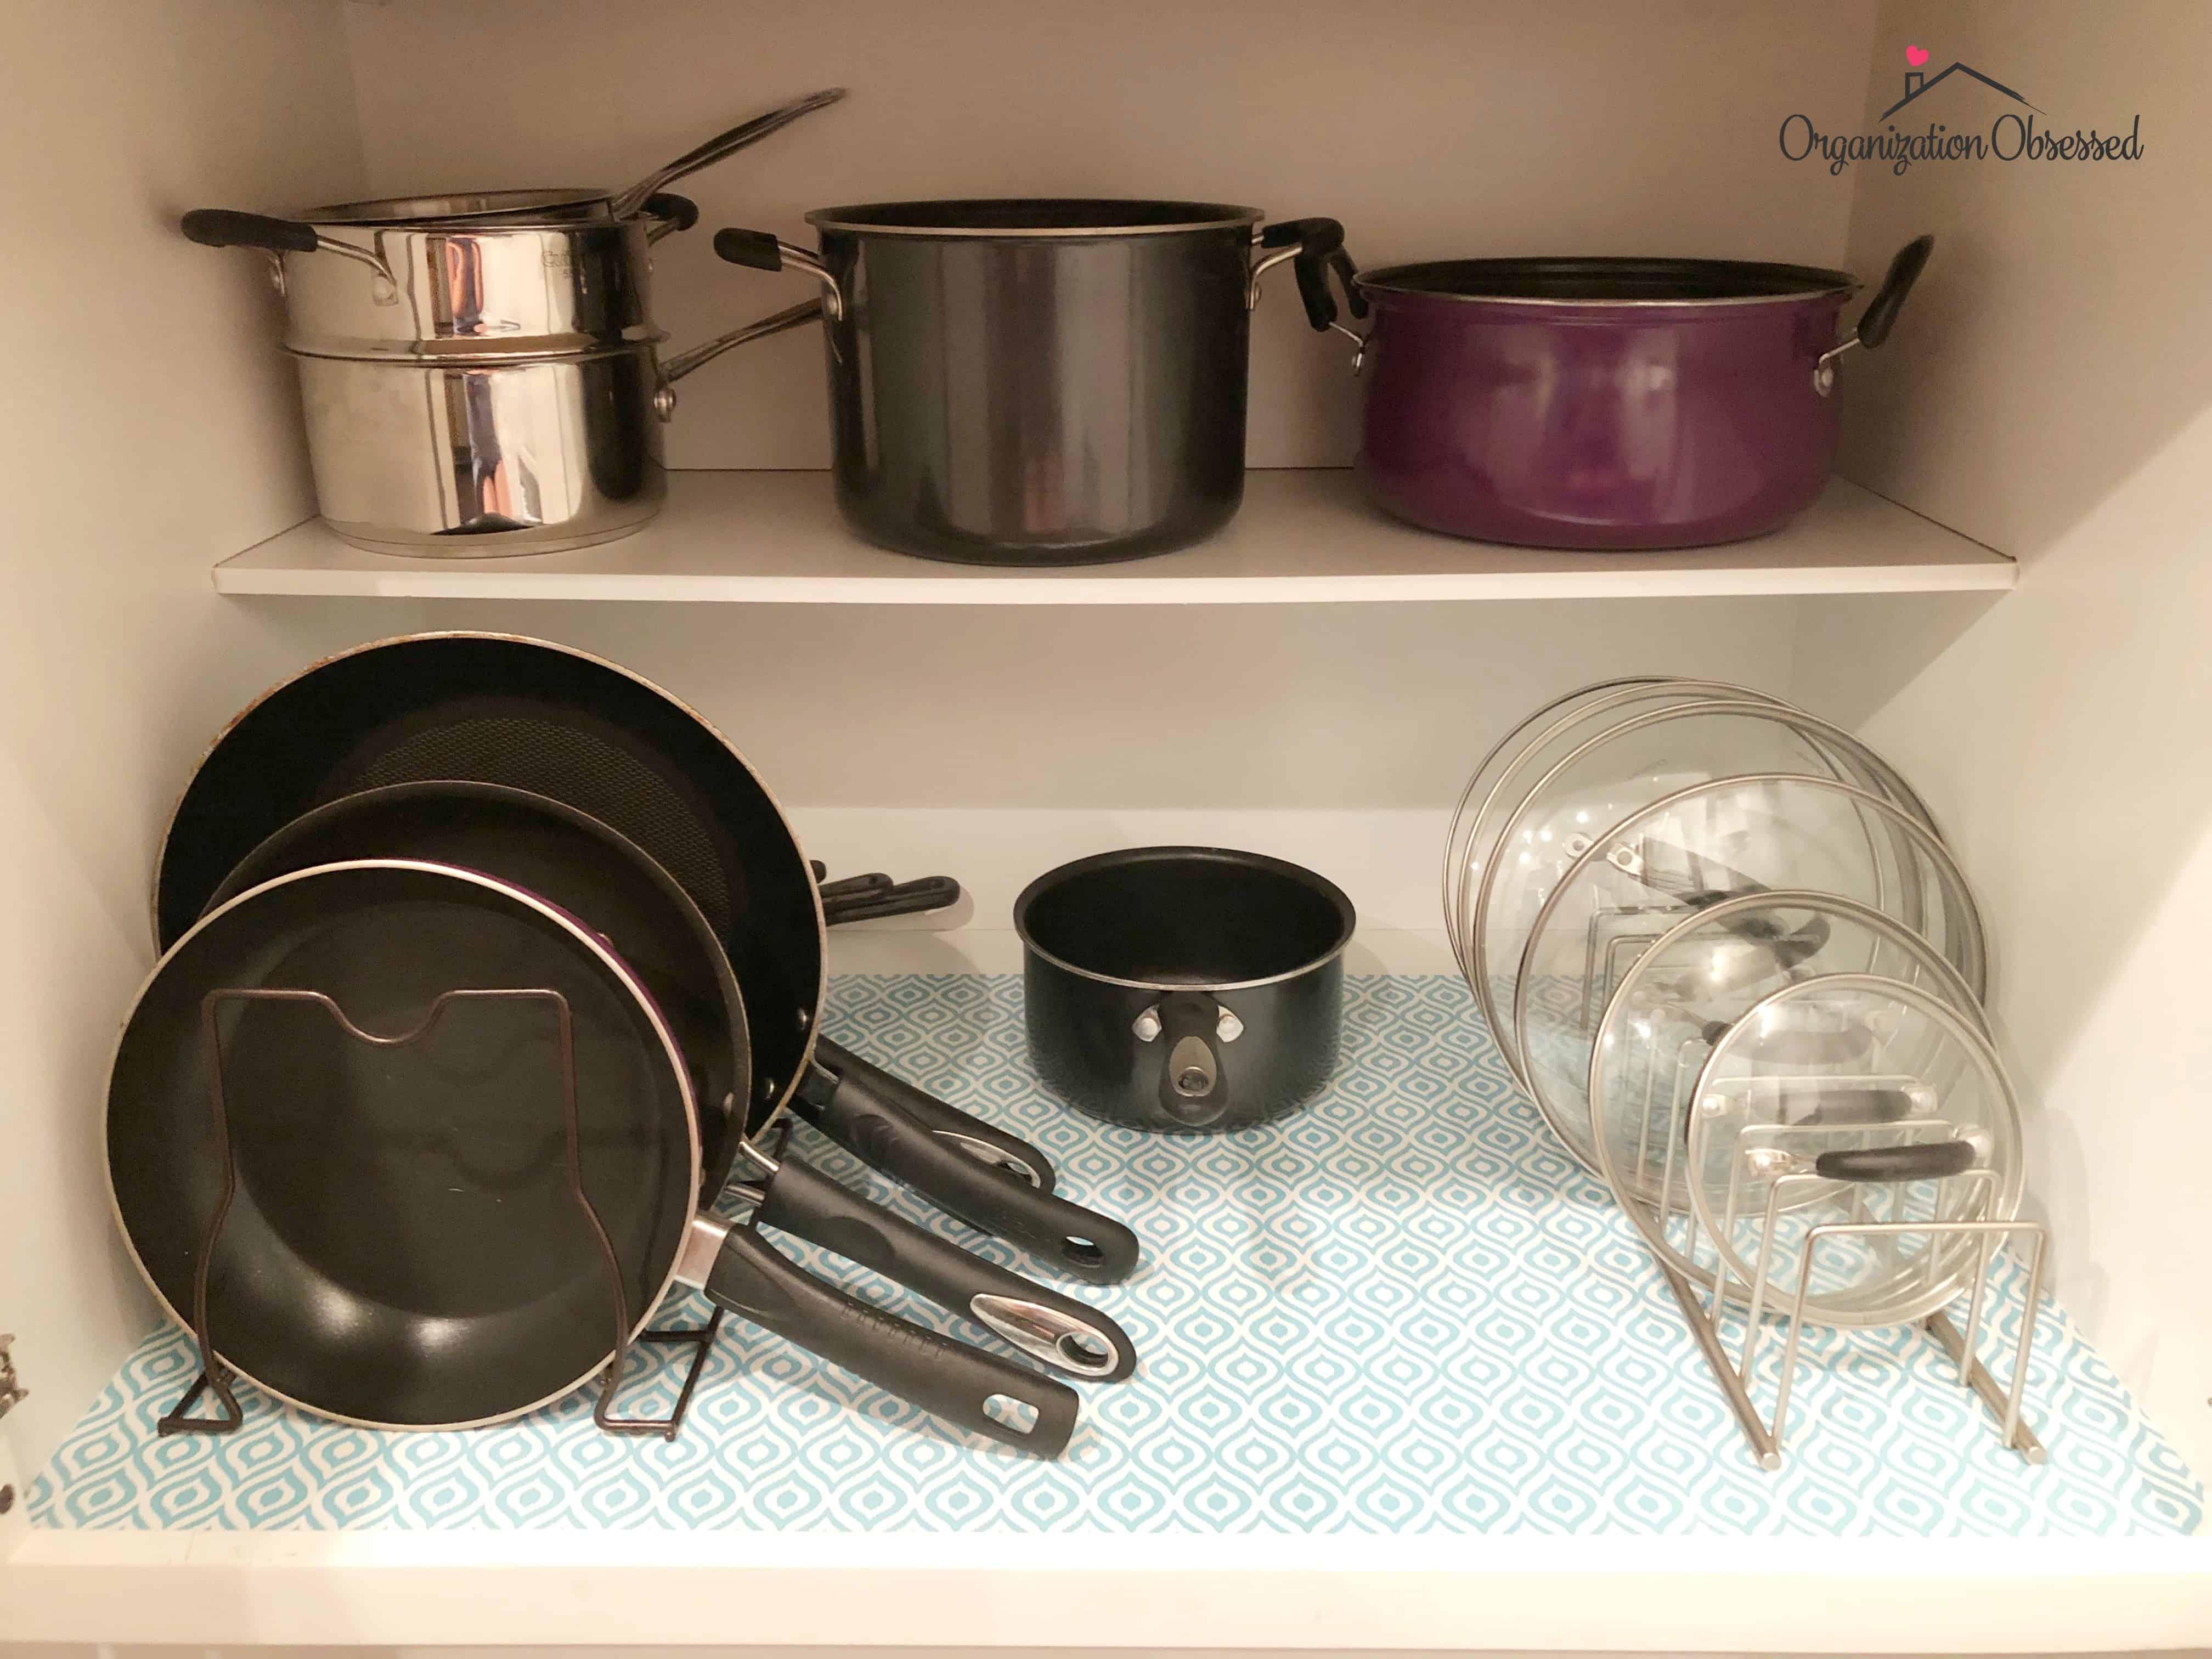 how to arrange pots and pans in kitchen materials 16 genius ways organize cabinets organization